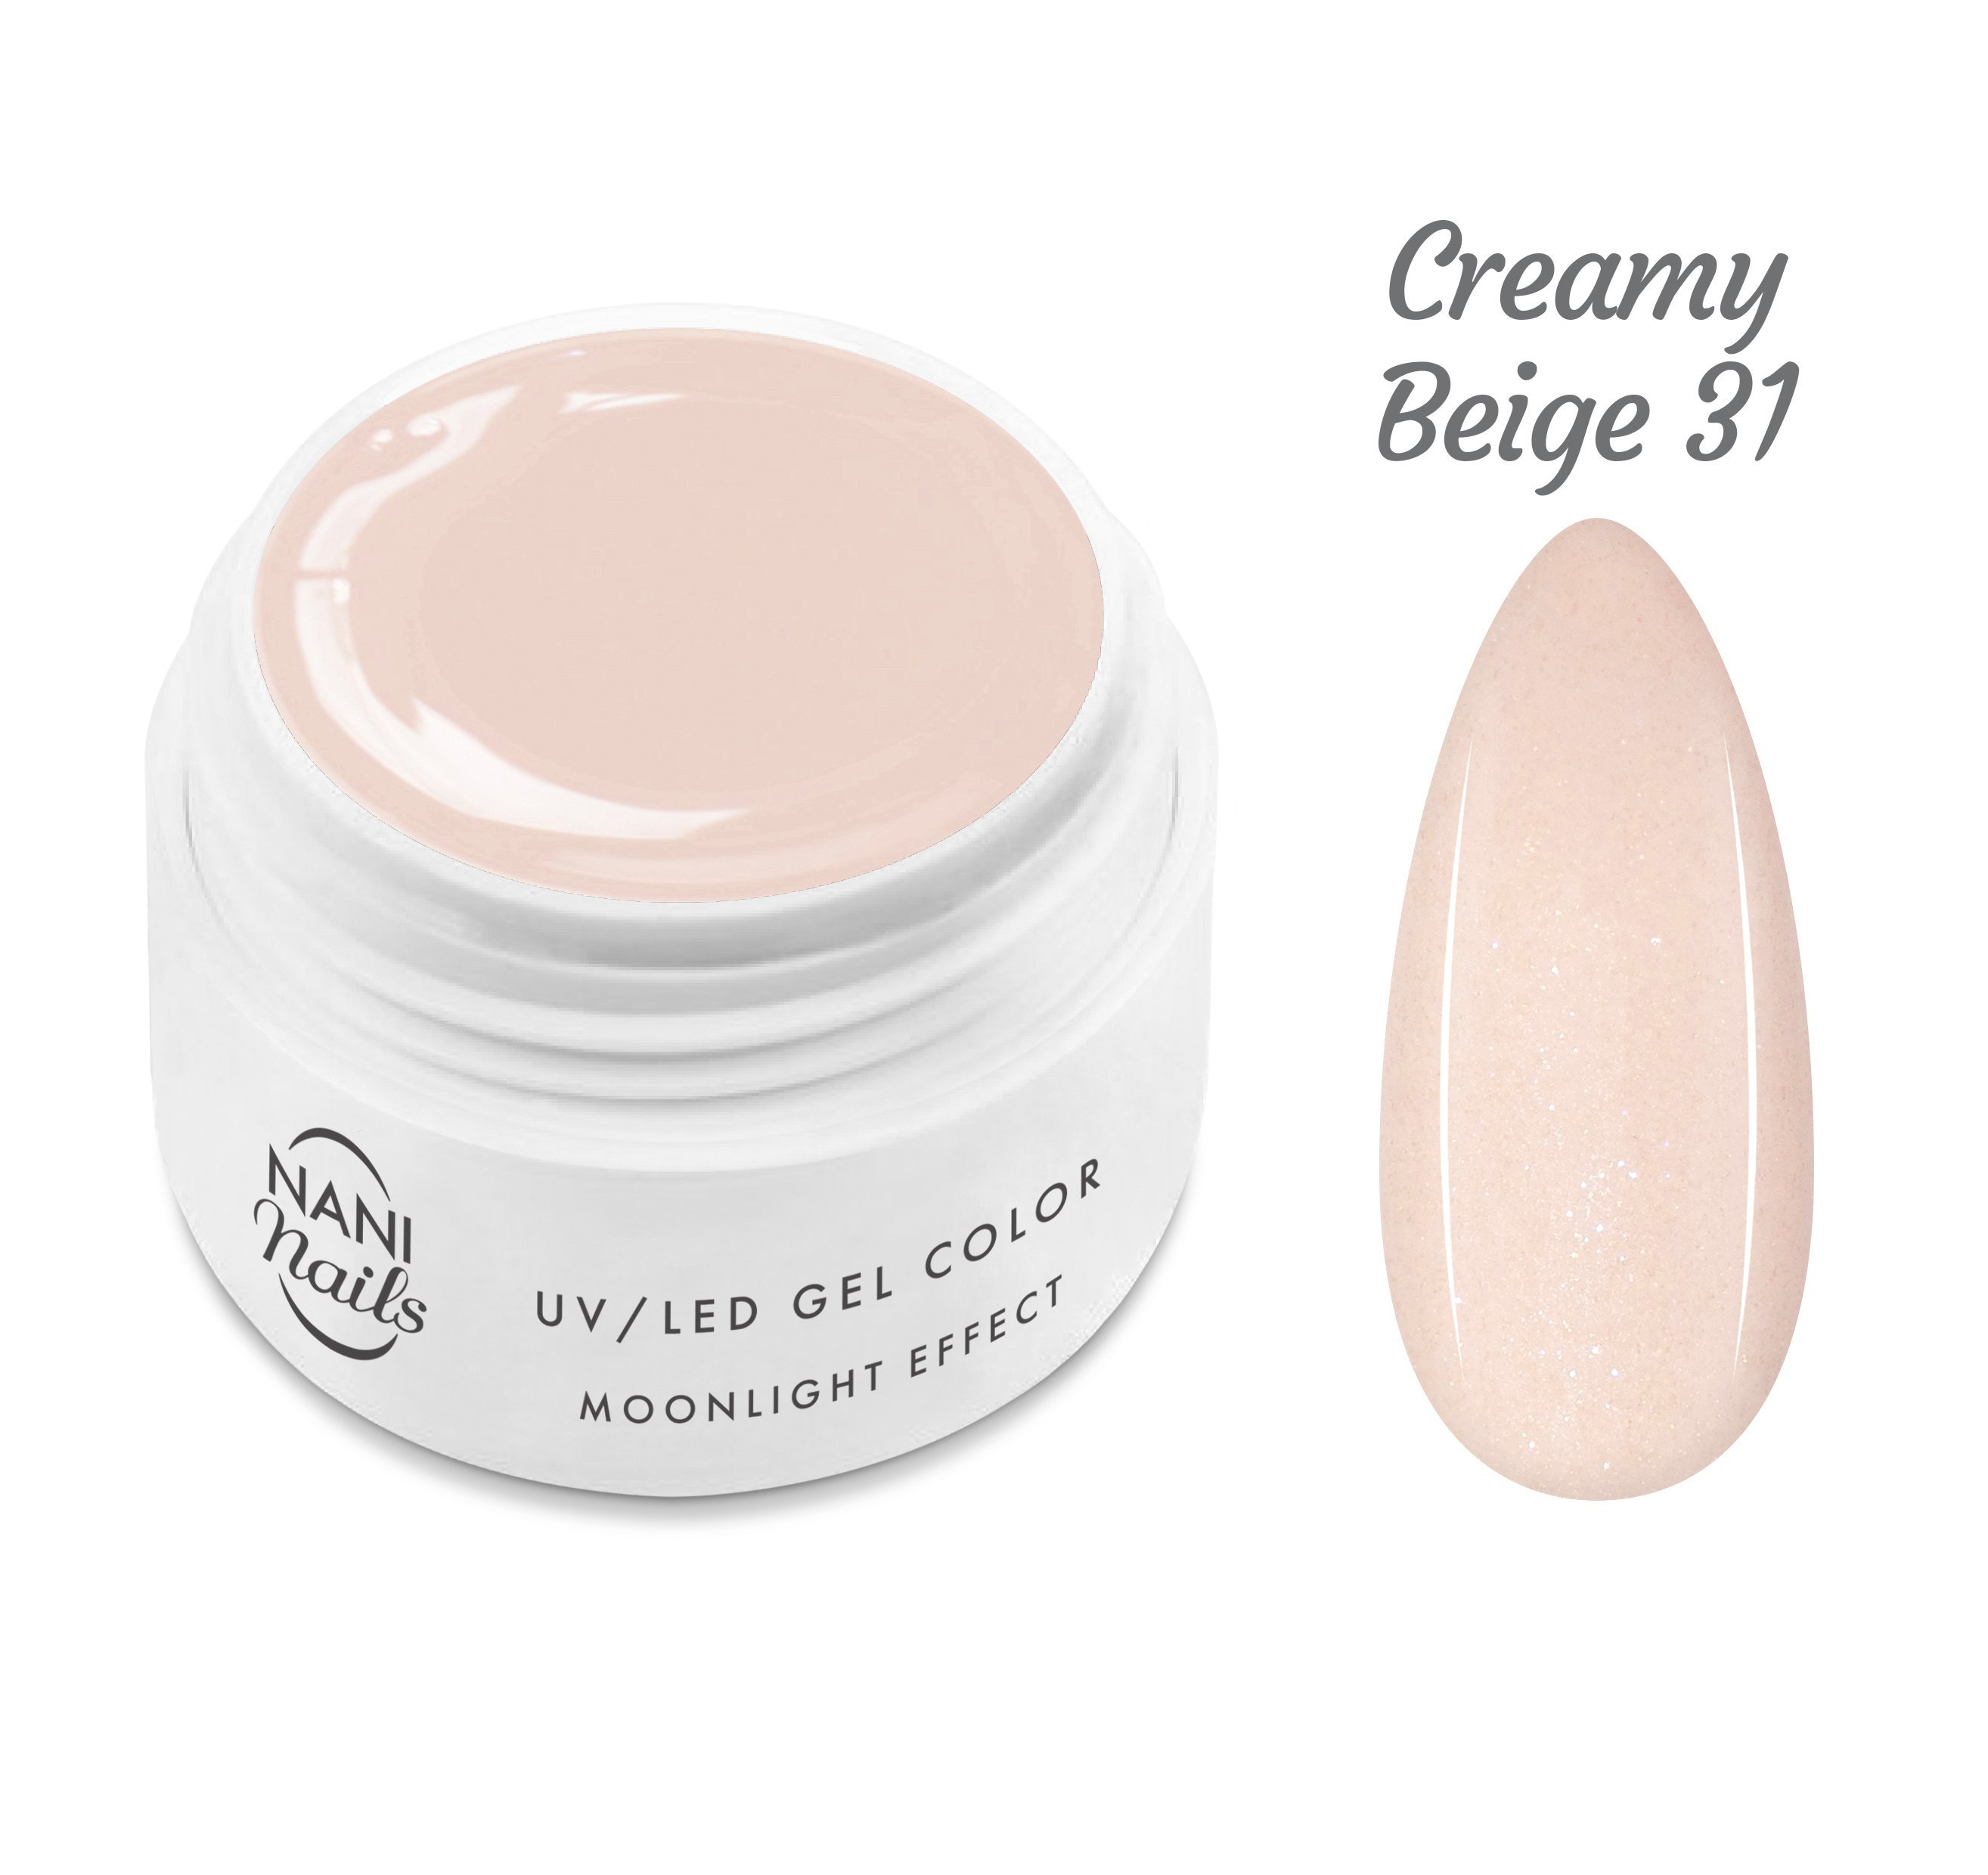 NANI UV gél Moonlight Effect 5 ml - Creamy Beige